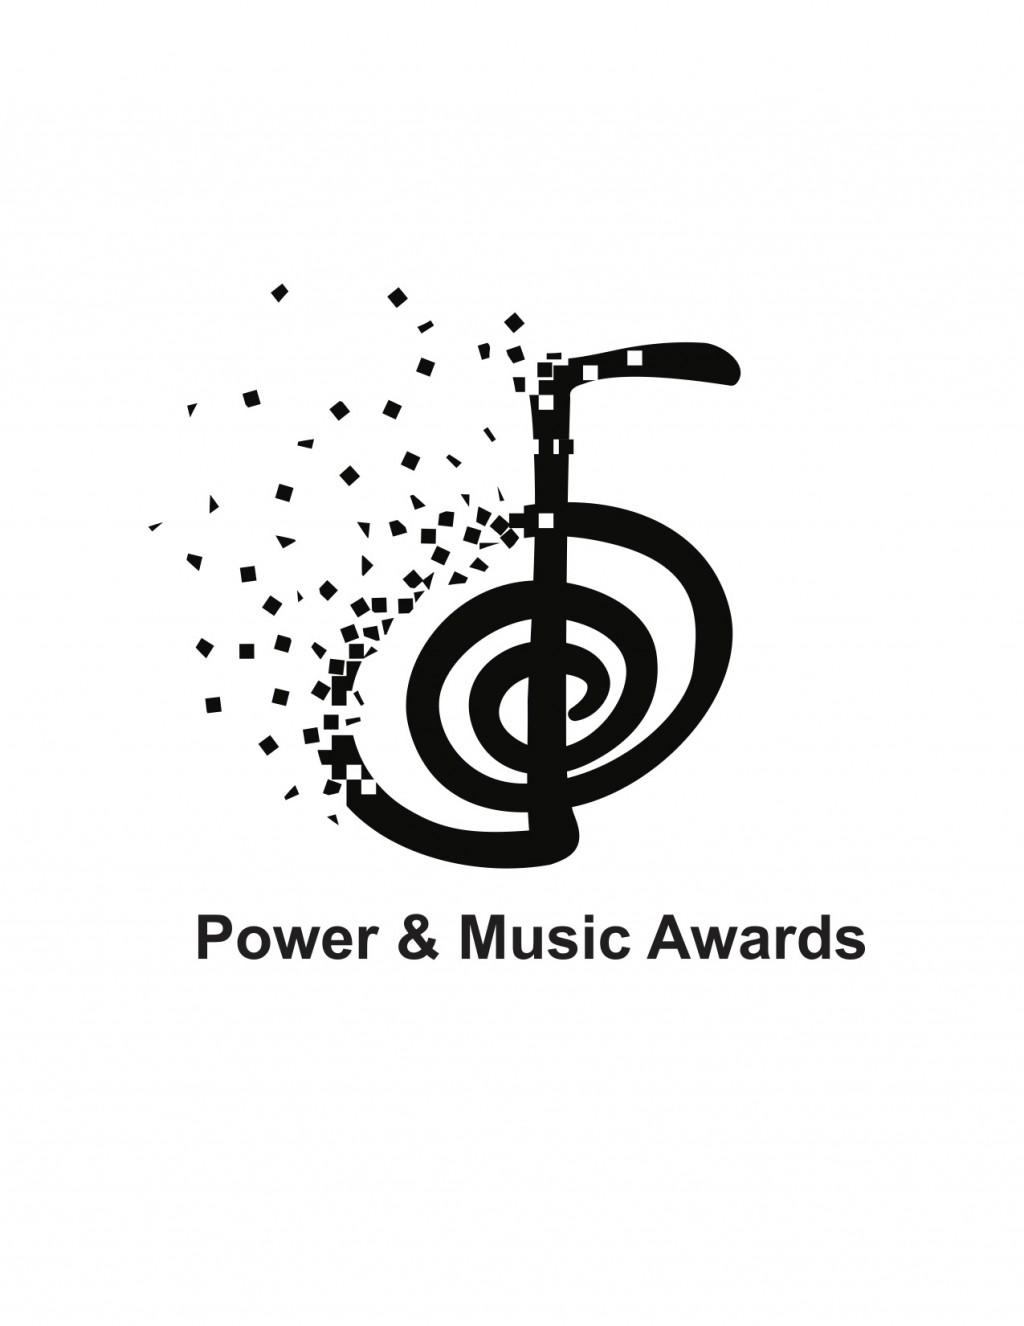 PM Awards